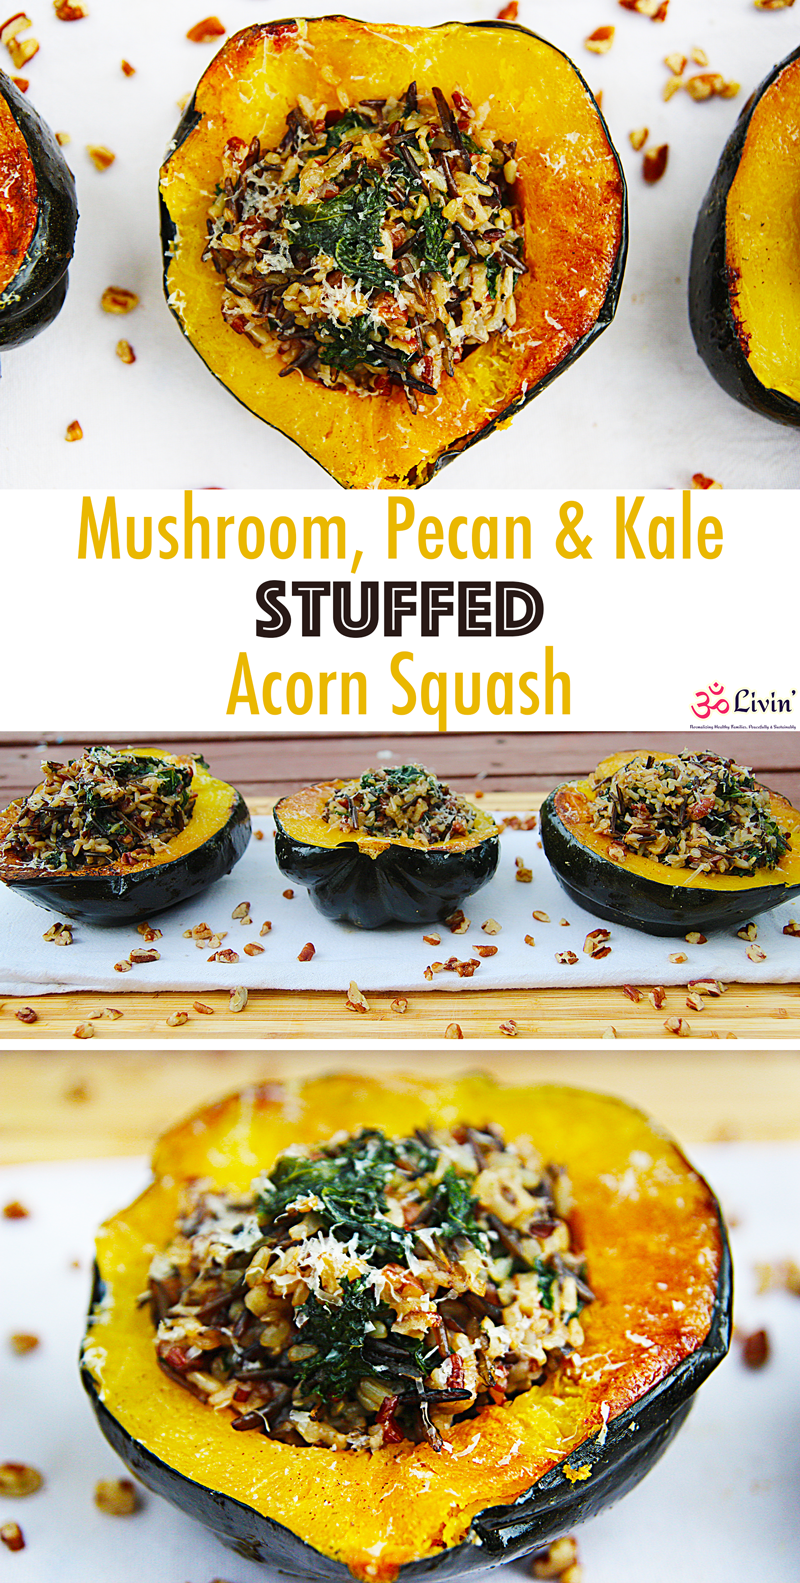 Men S Health Whole Food Recipes Vegetarian Thanksgiving Acorn